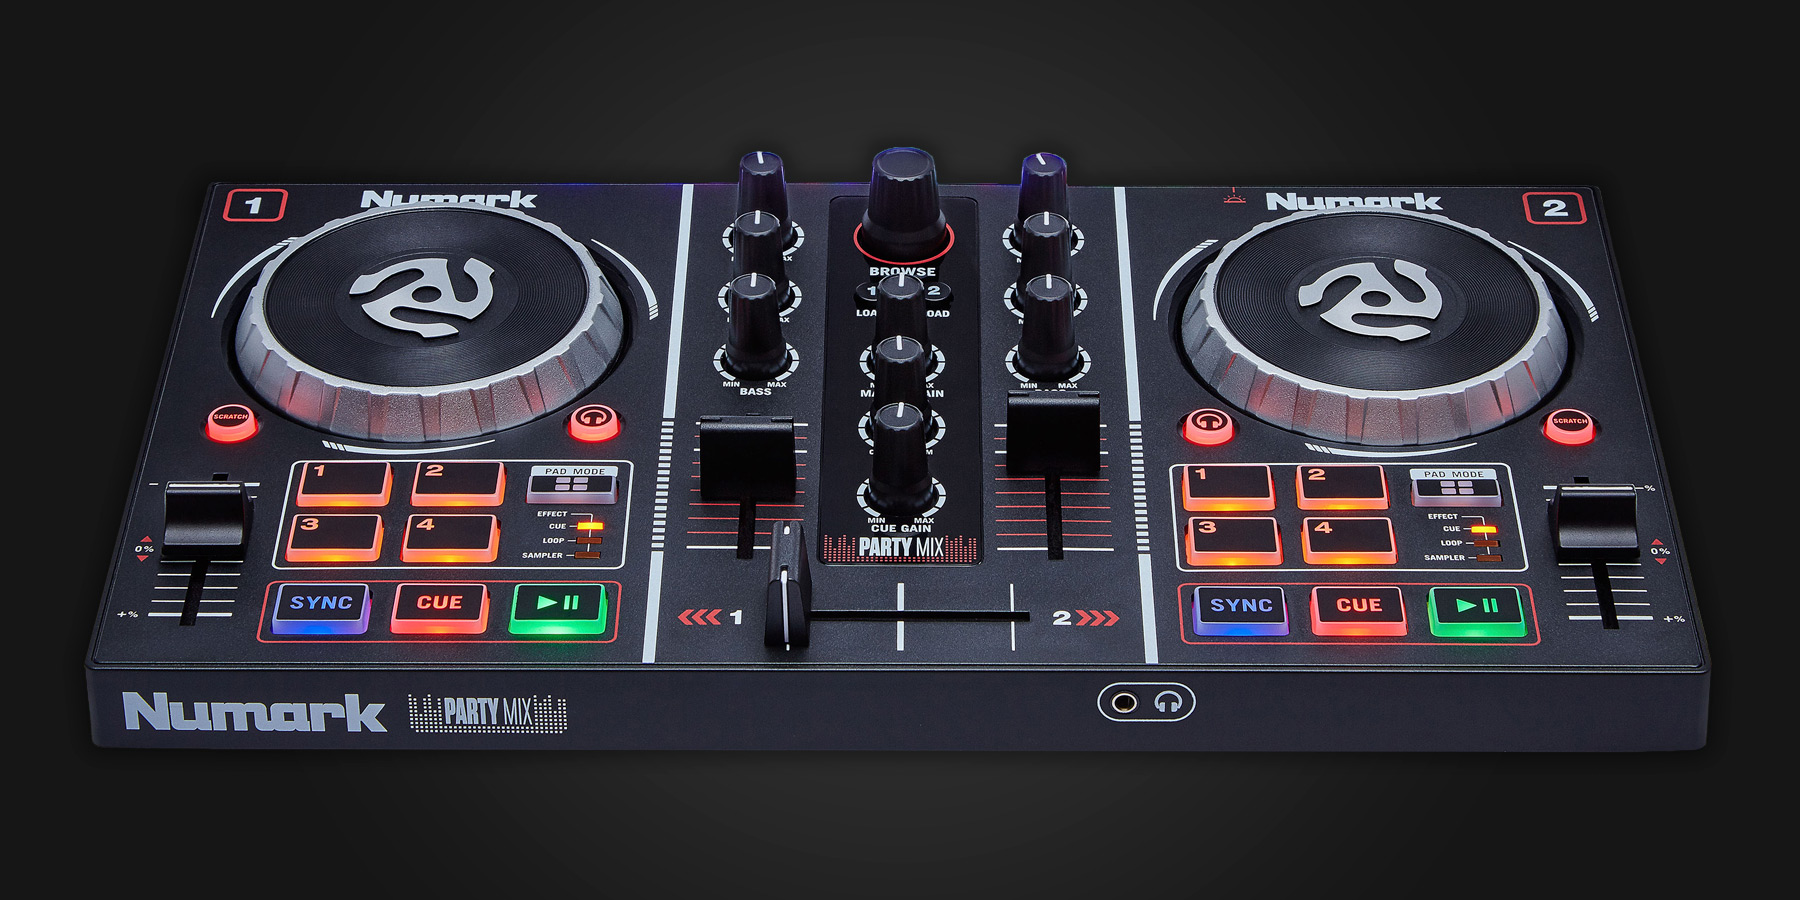 Numark Party Mix - Serato DJ Hardware